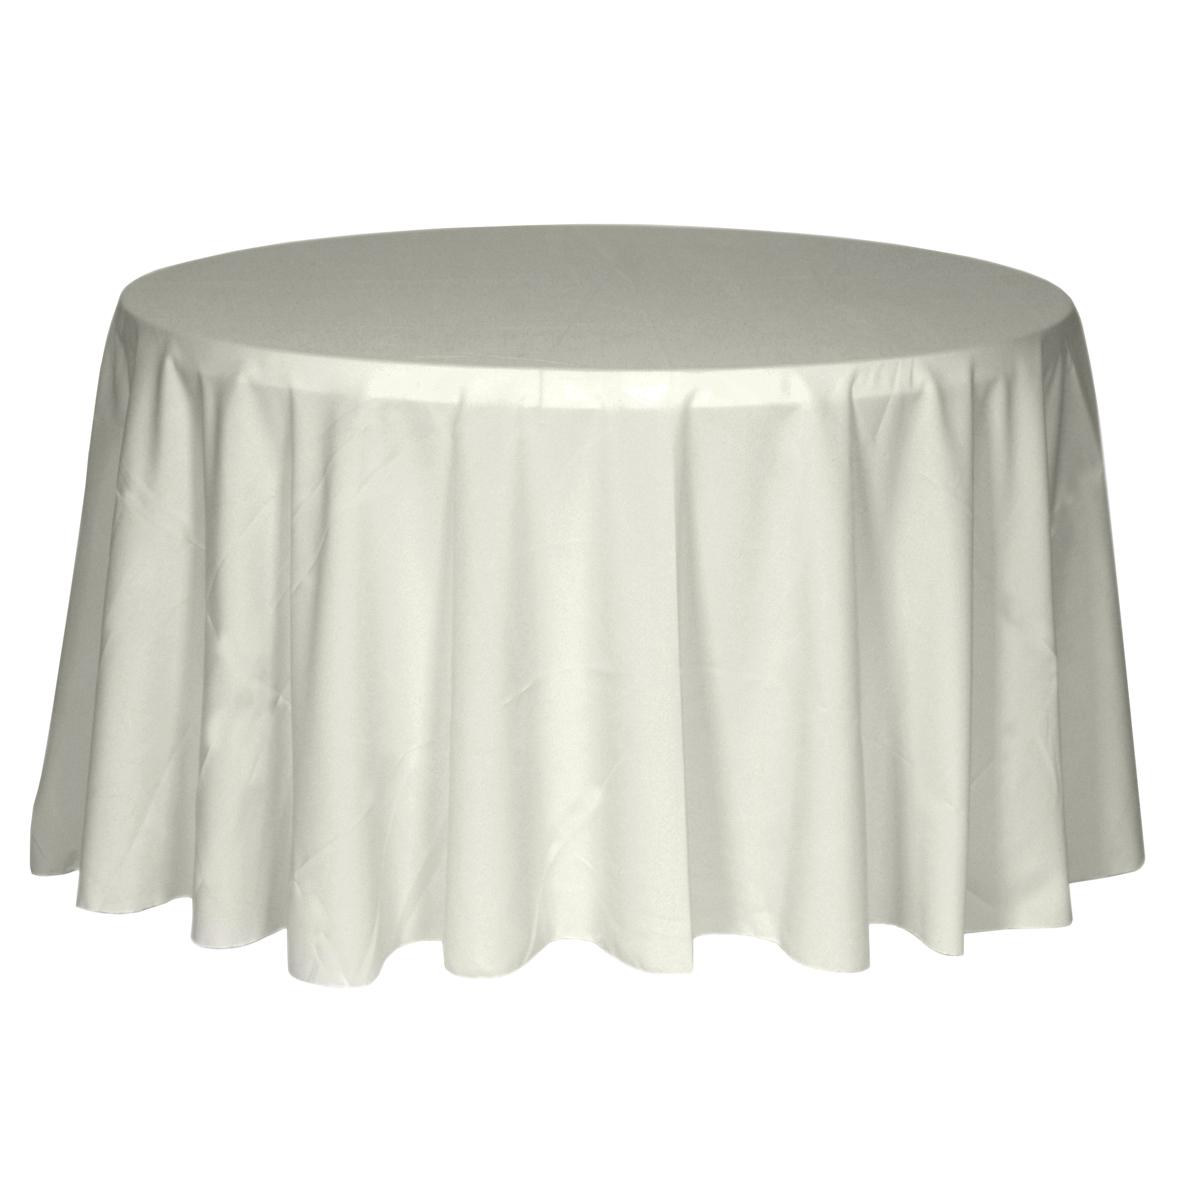 round-tablecloth.jpg